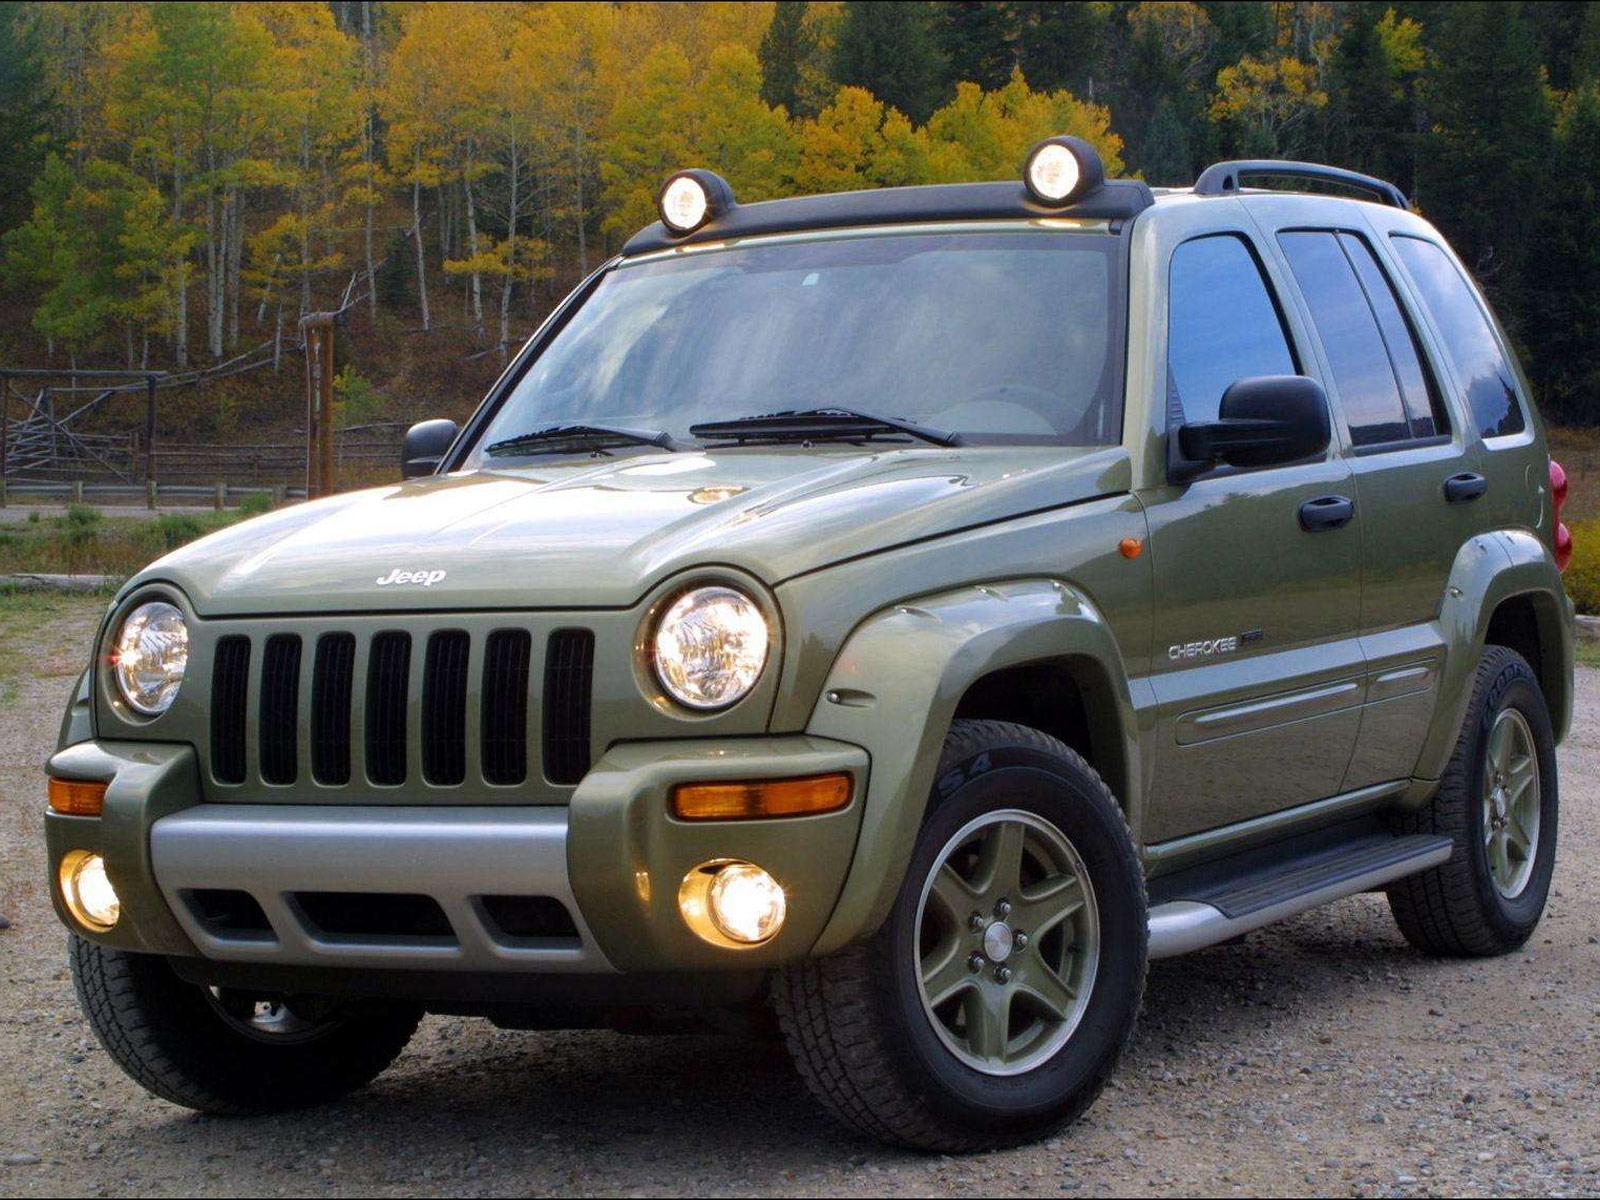 2003 jeep cherokee renegade car interior design. Black Bedroom Furniture Sets. Home Design Ideas